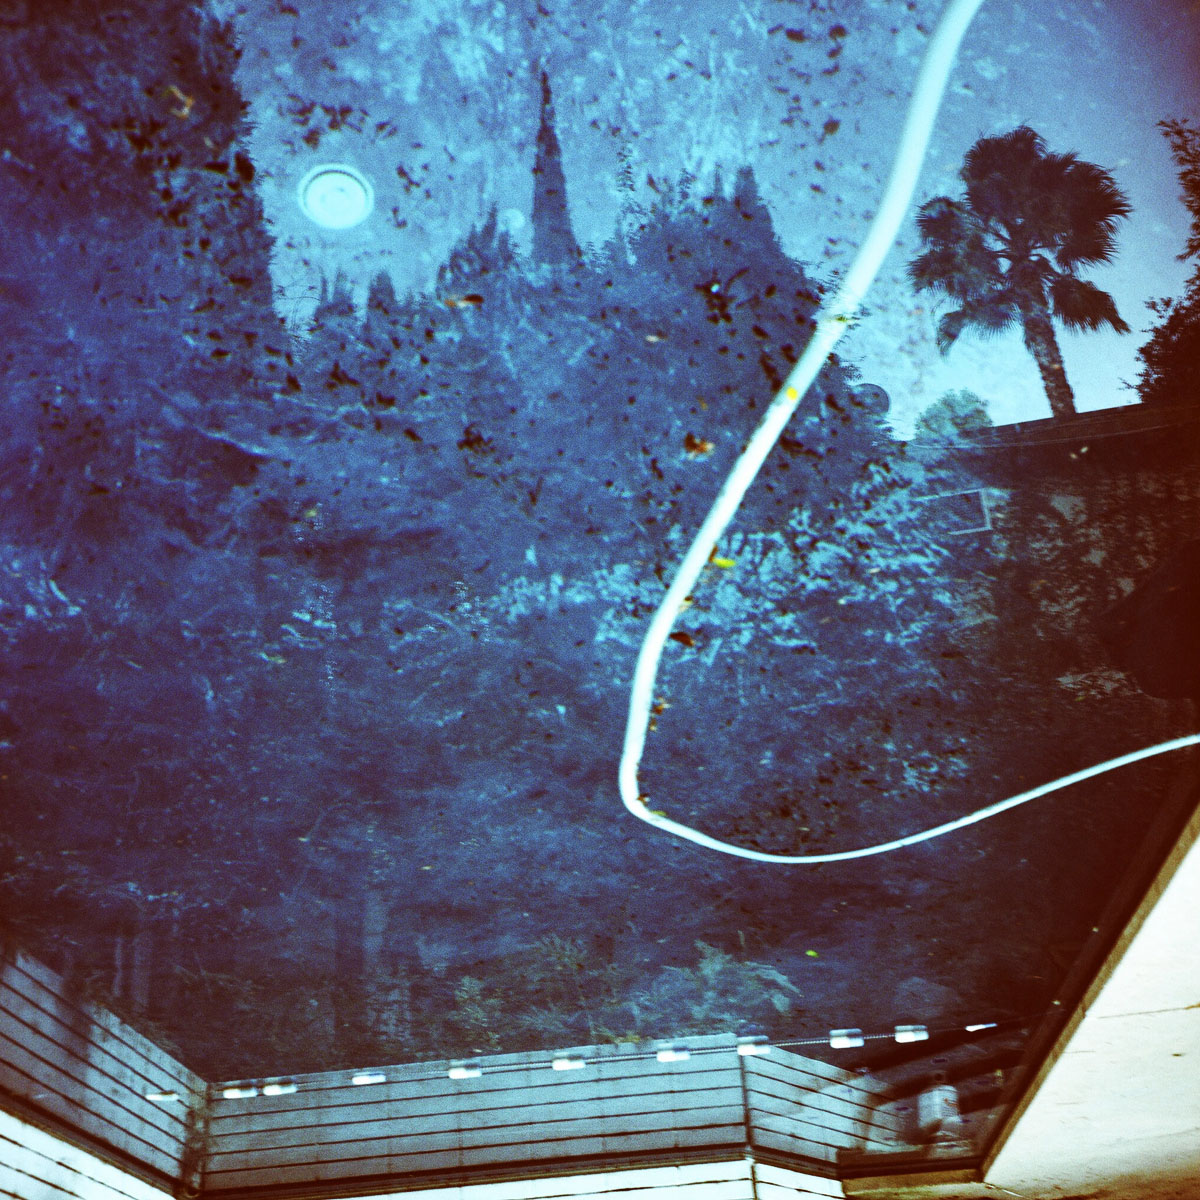 Poolscape #07, 2010